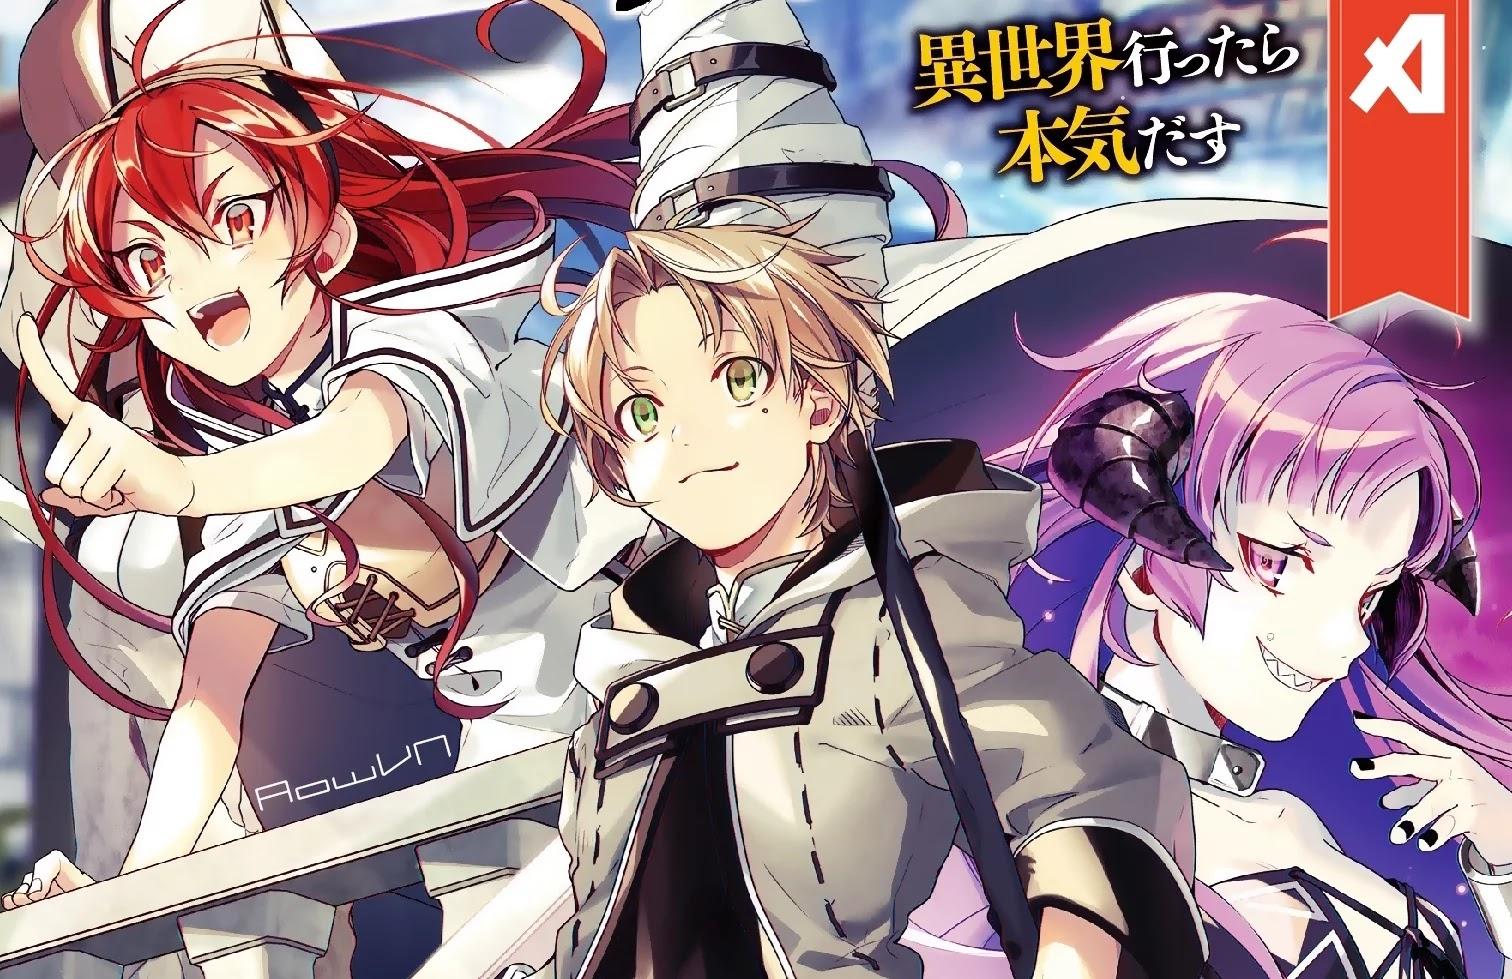 isekai aowvn - Mushoku Tensei - Isekai Ittara Honki Dasu | Manga Online - Hấp Dẫn